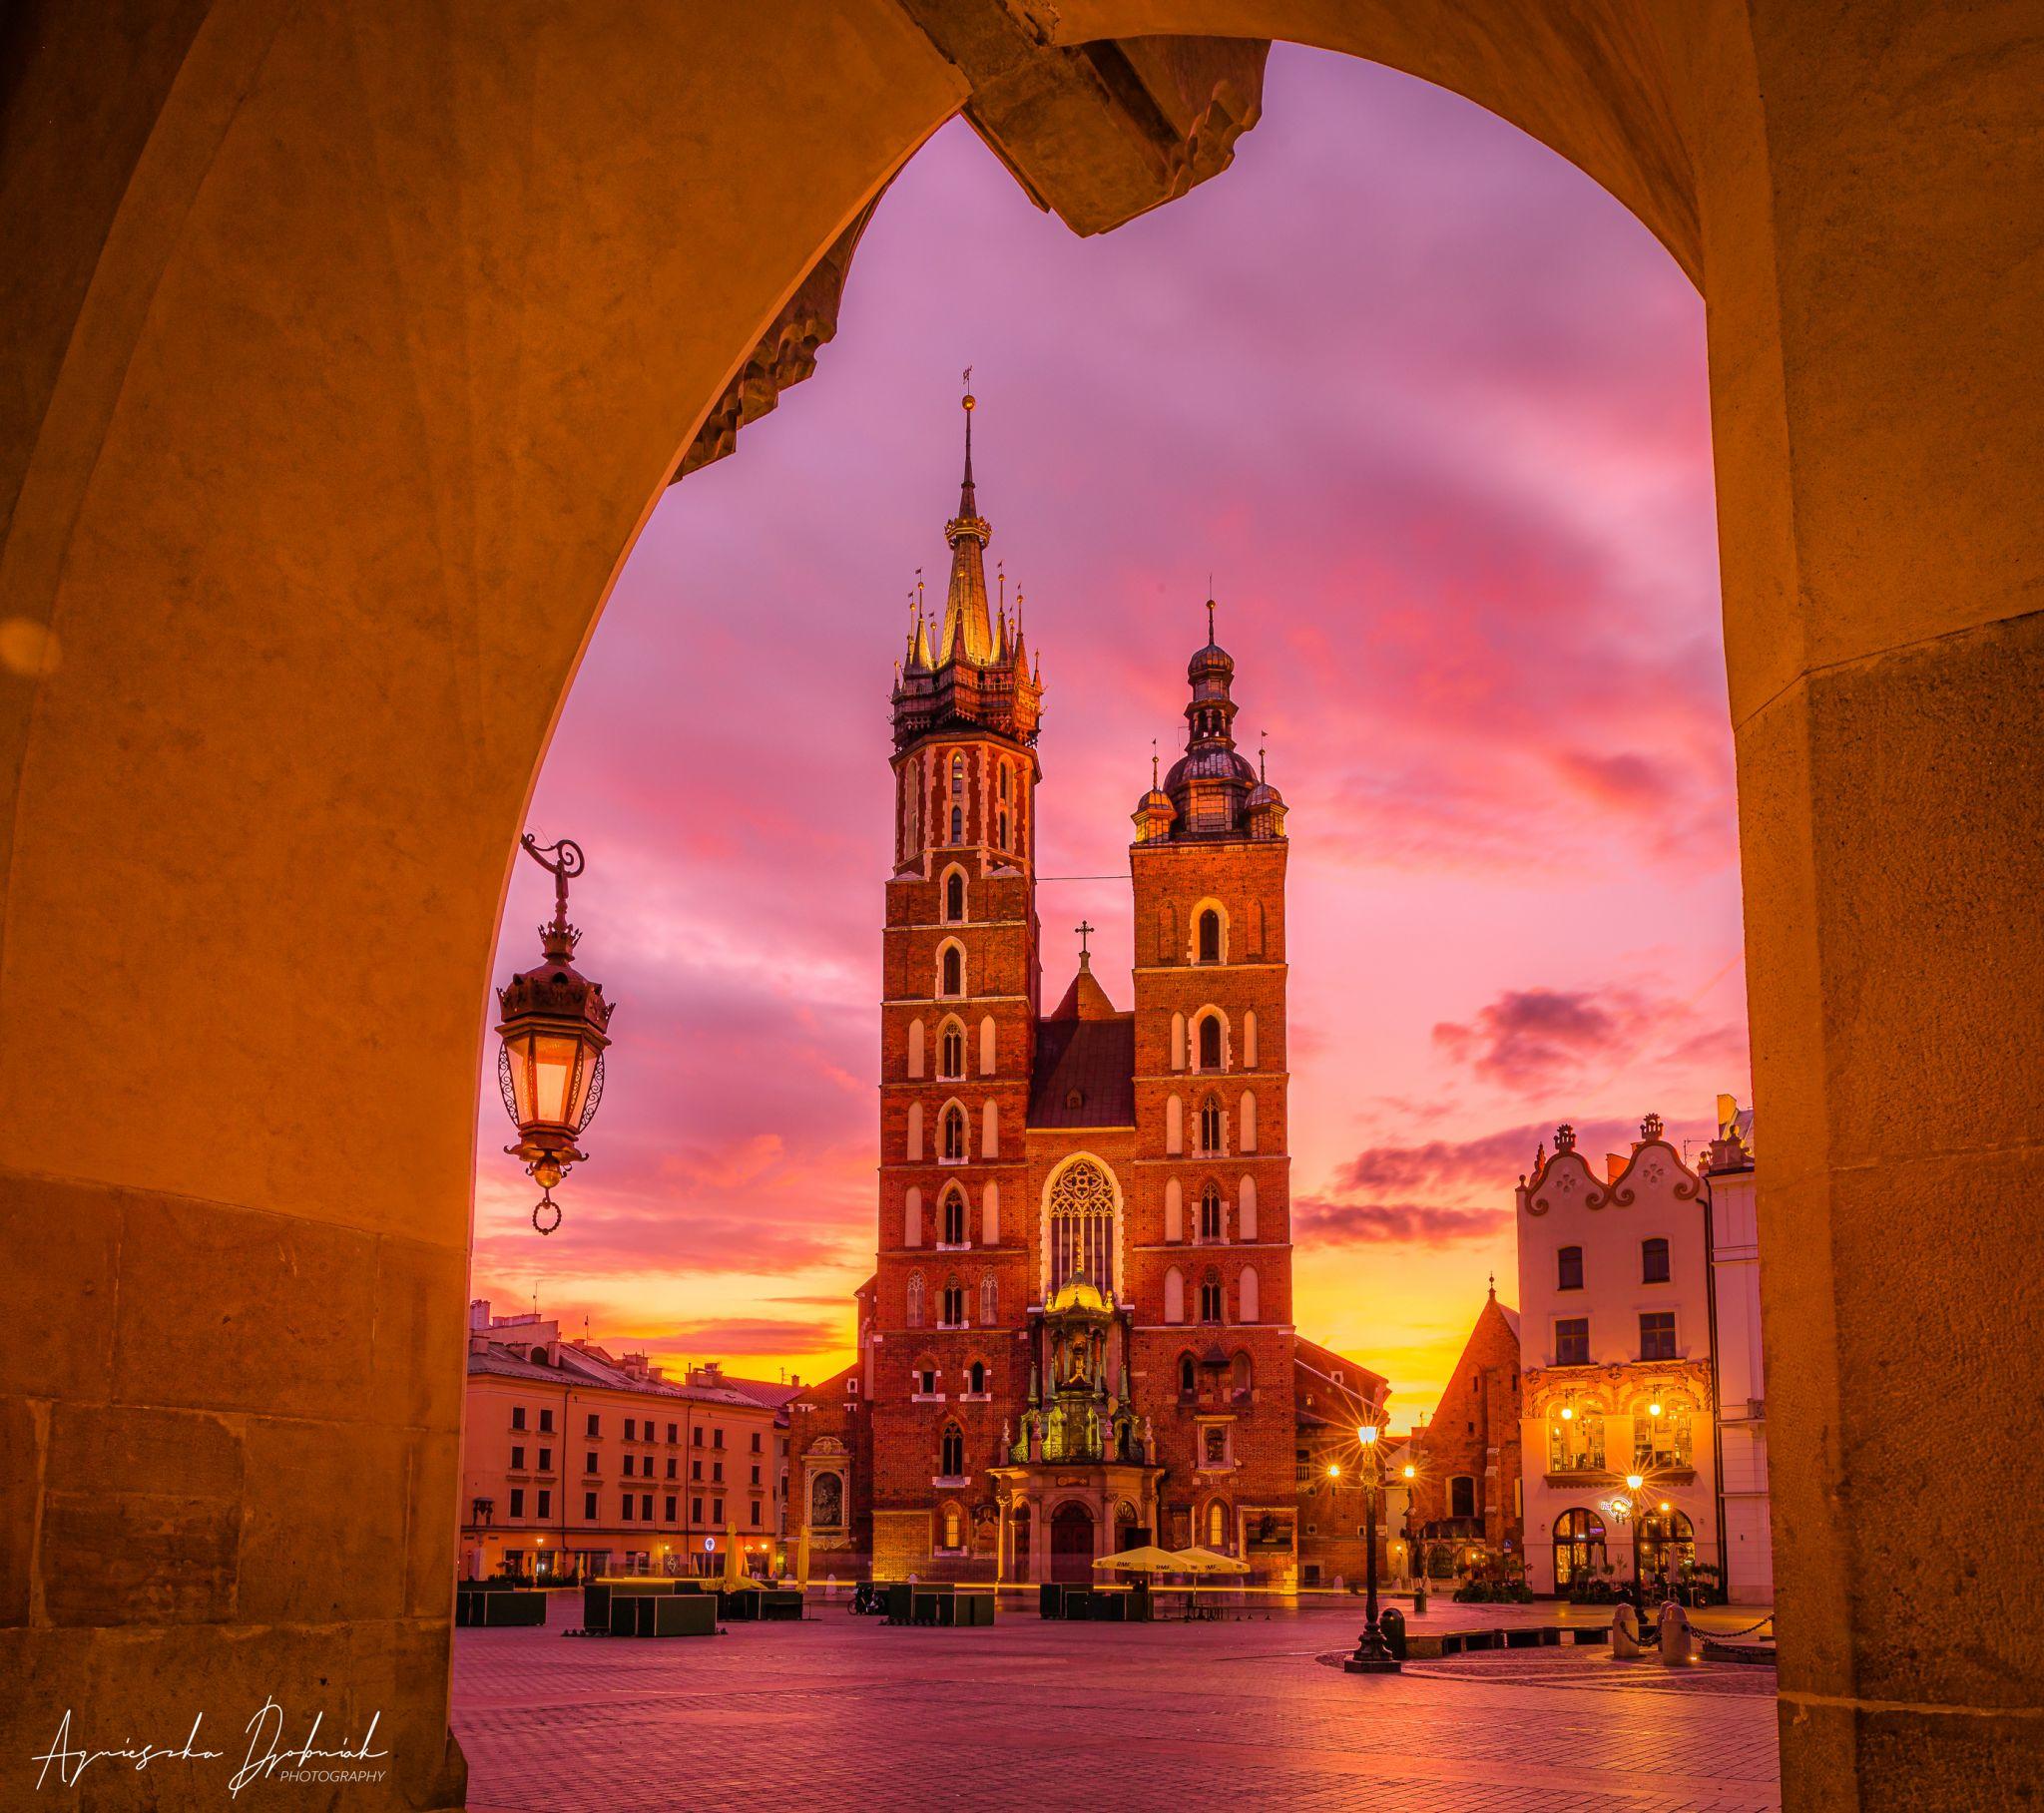 Kraków Main Square, Poland